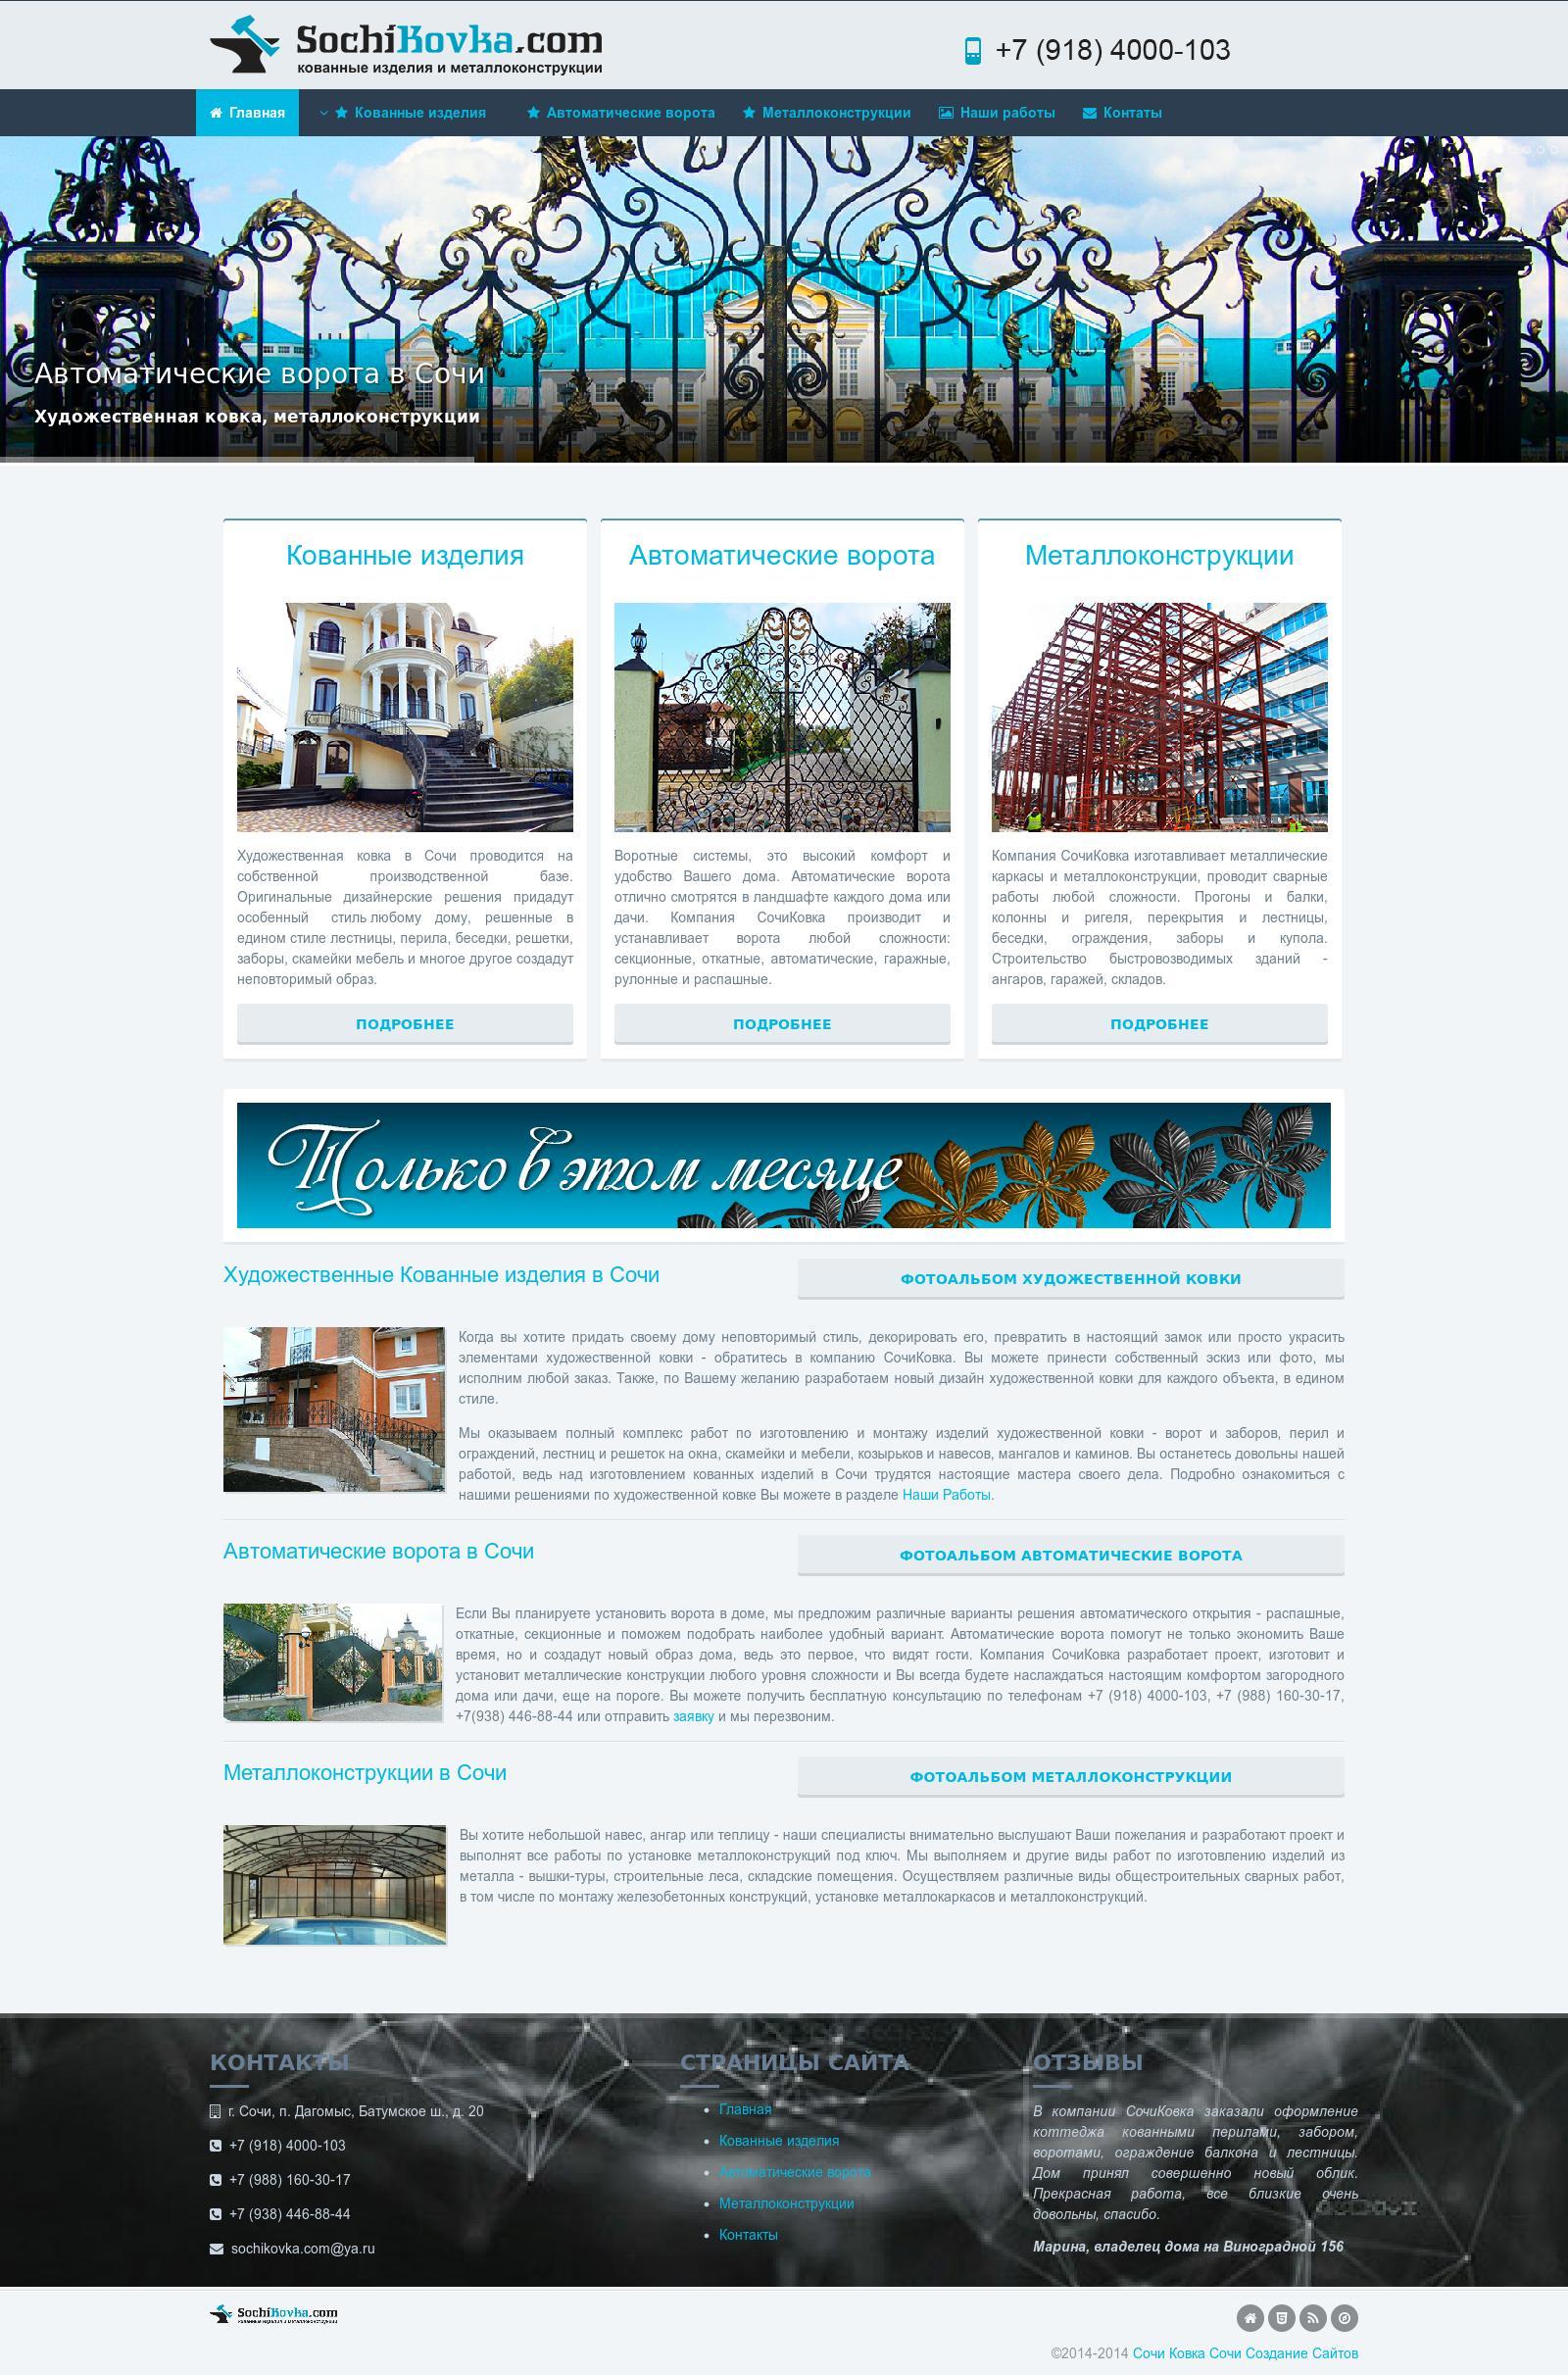 Промо Сайт компании Сочи Ковка